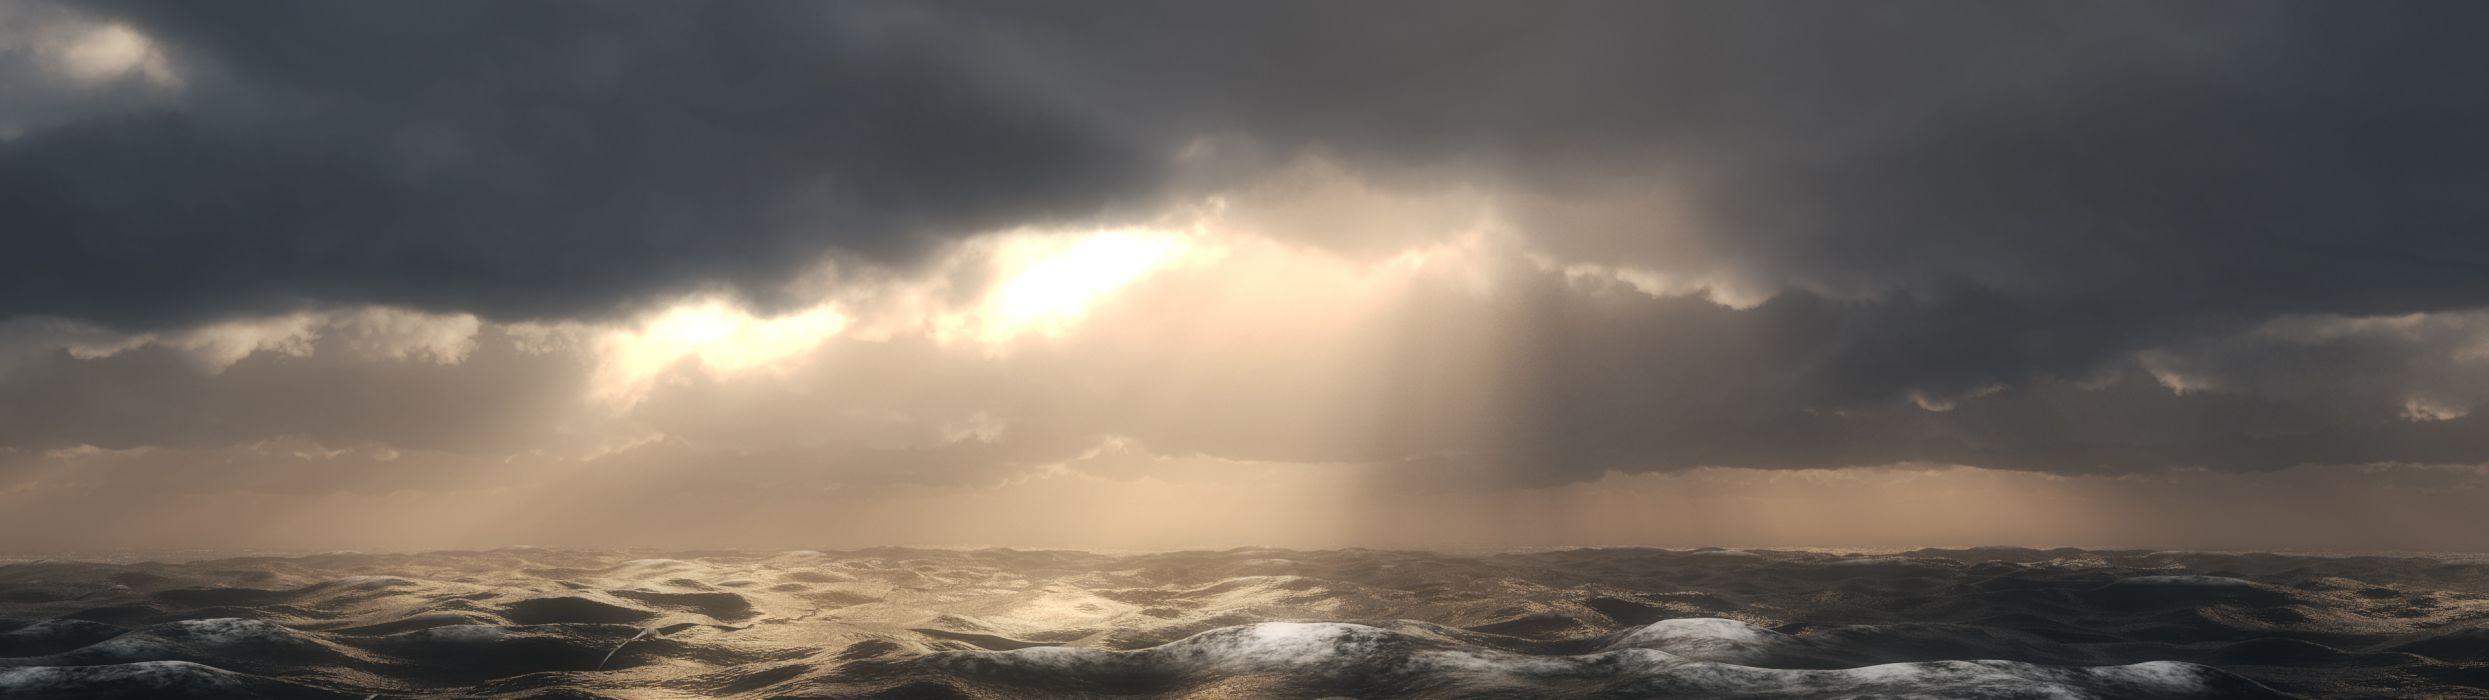 Sea Waves (3840x1080) wallpaper